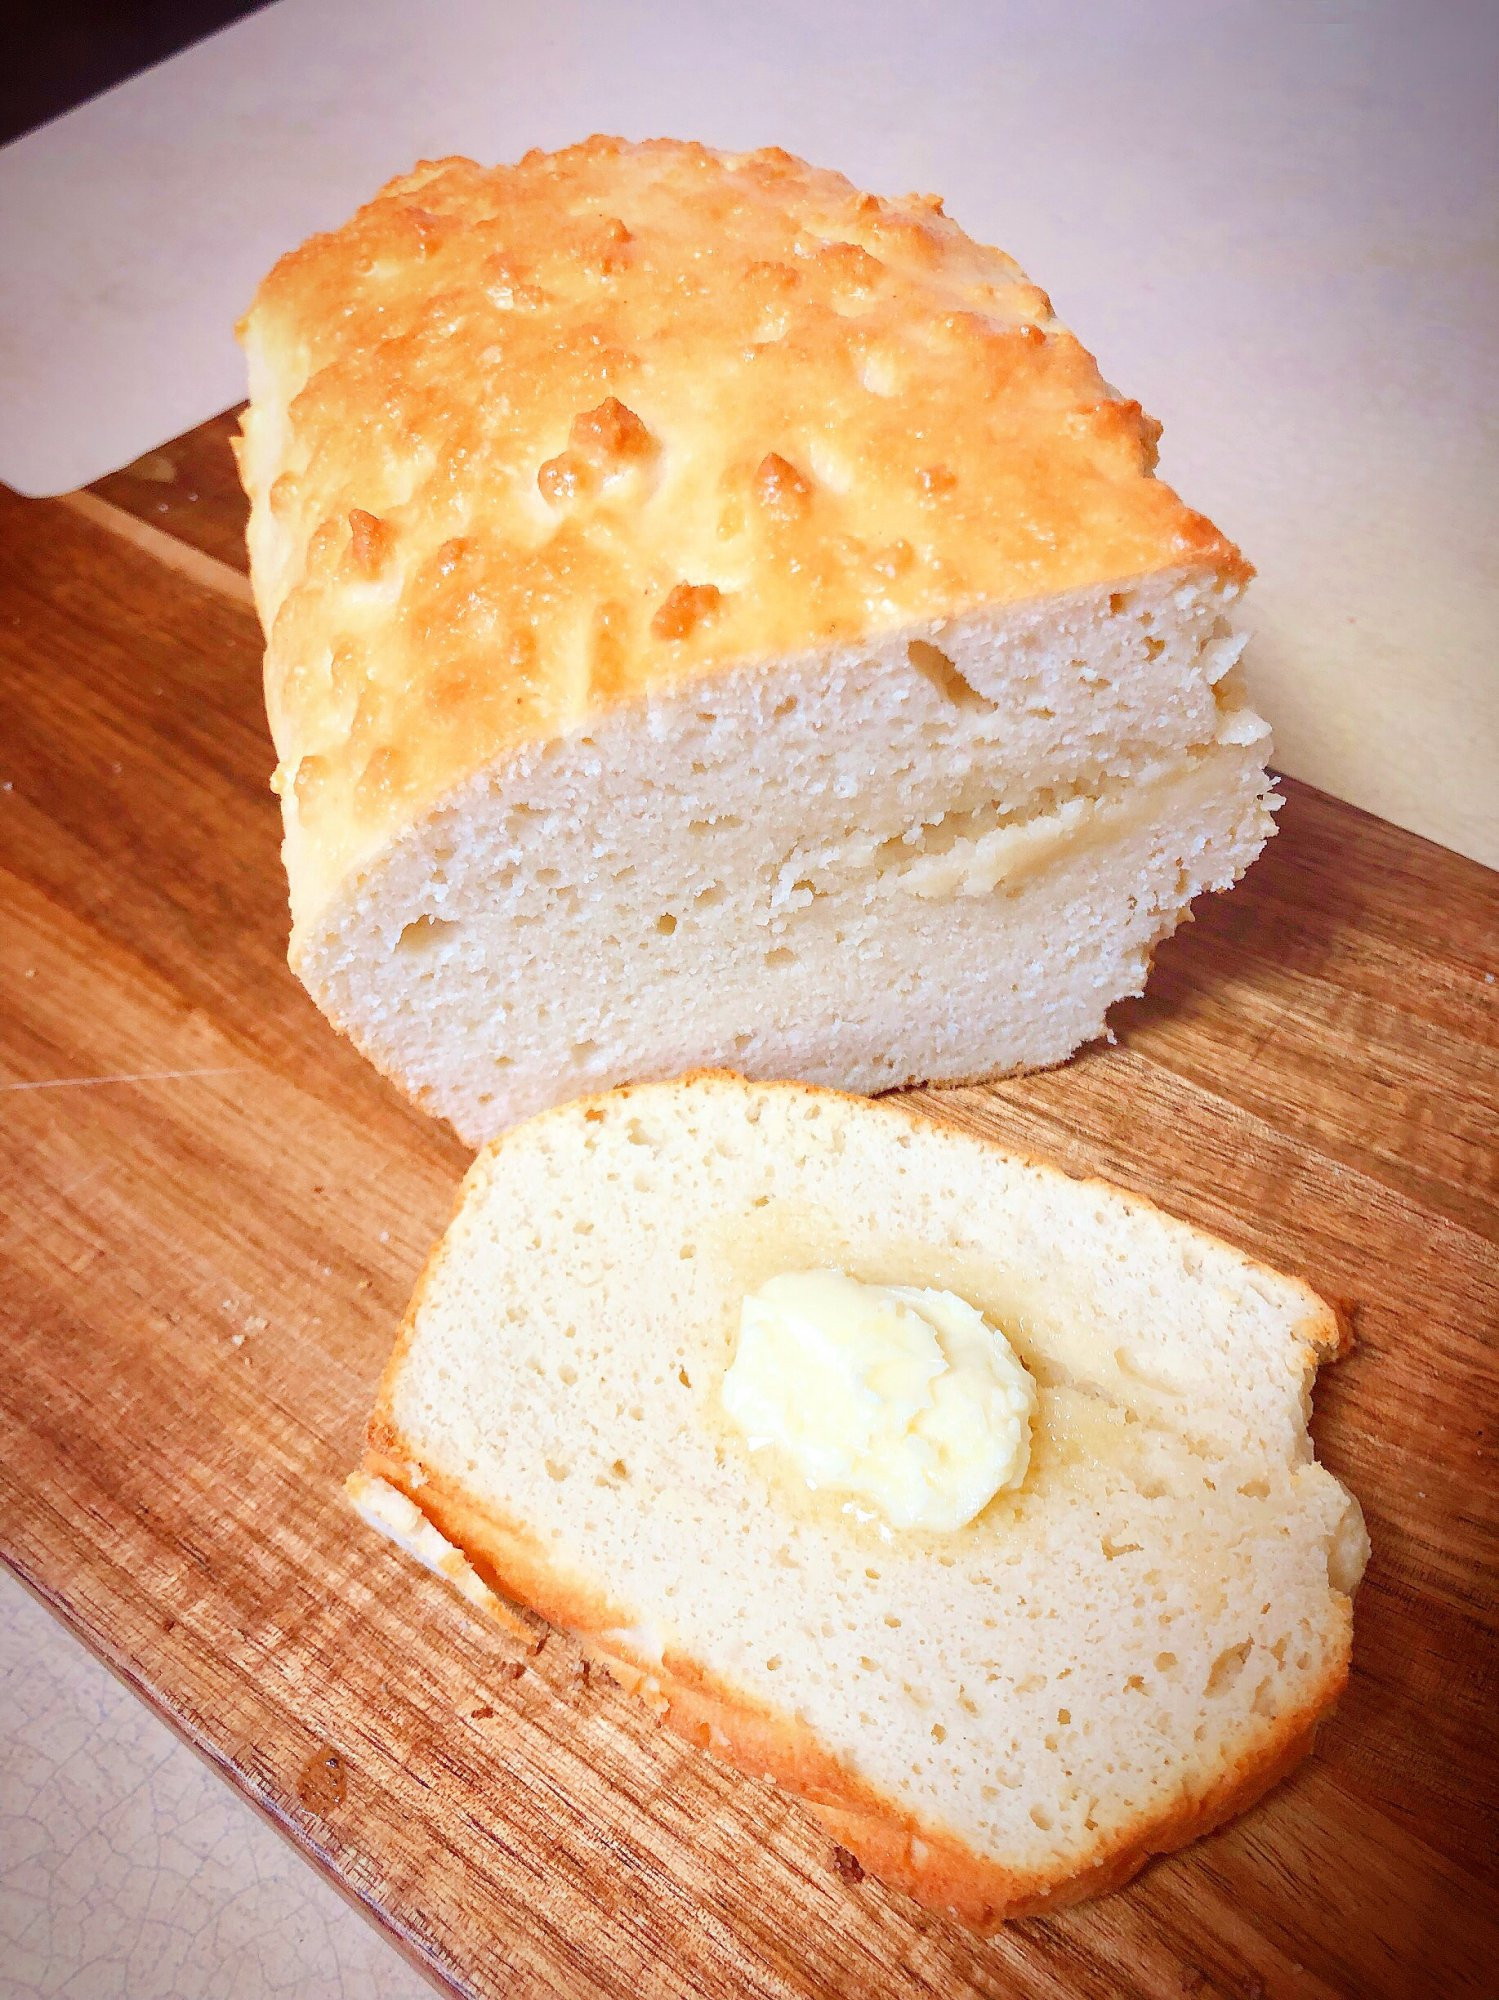 Keto Gluten Free Bread  Eggless Low Carb Bread Keto Low Carb Gluten Free